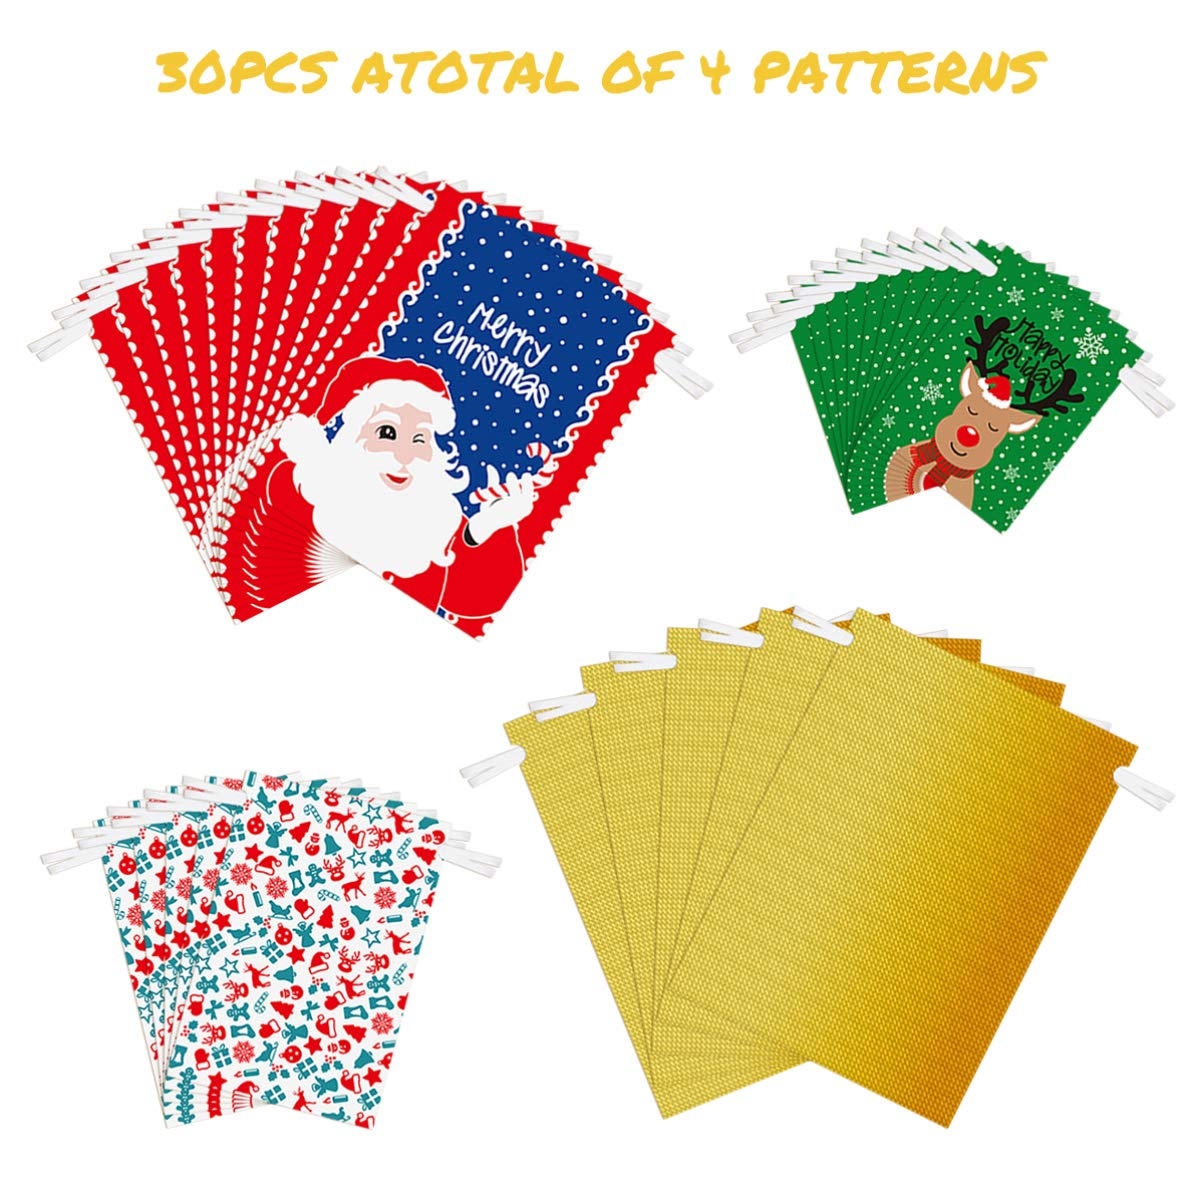 Amosfun Christmas Drawstring Gift Bags 30pcs Assorted Christmas Gift Wrapping Bags Upgraded Christmas Goodie Bags for Birthday Christmas Party